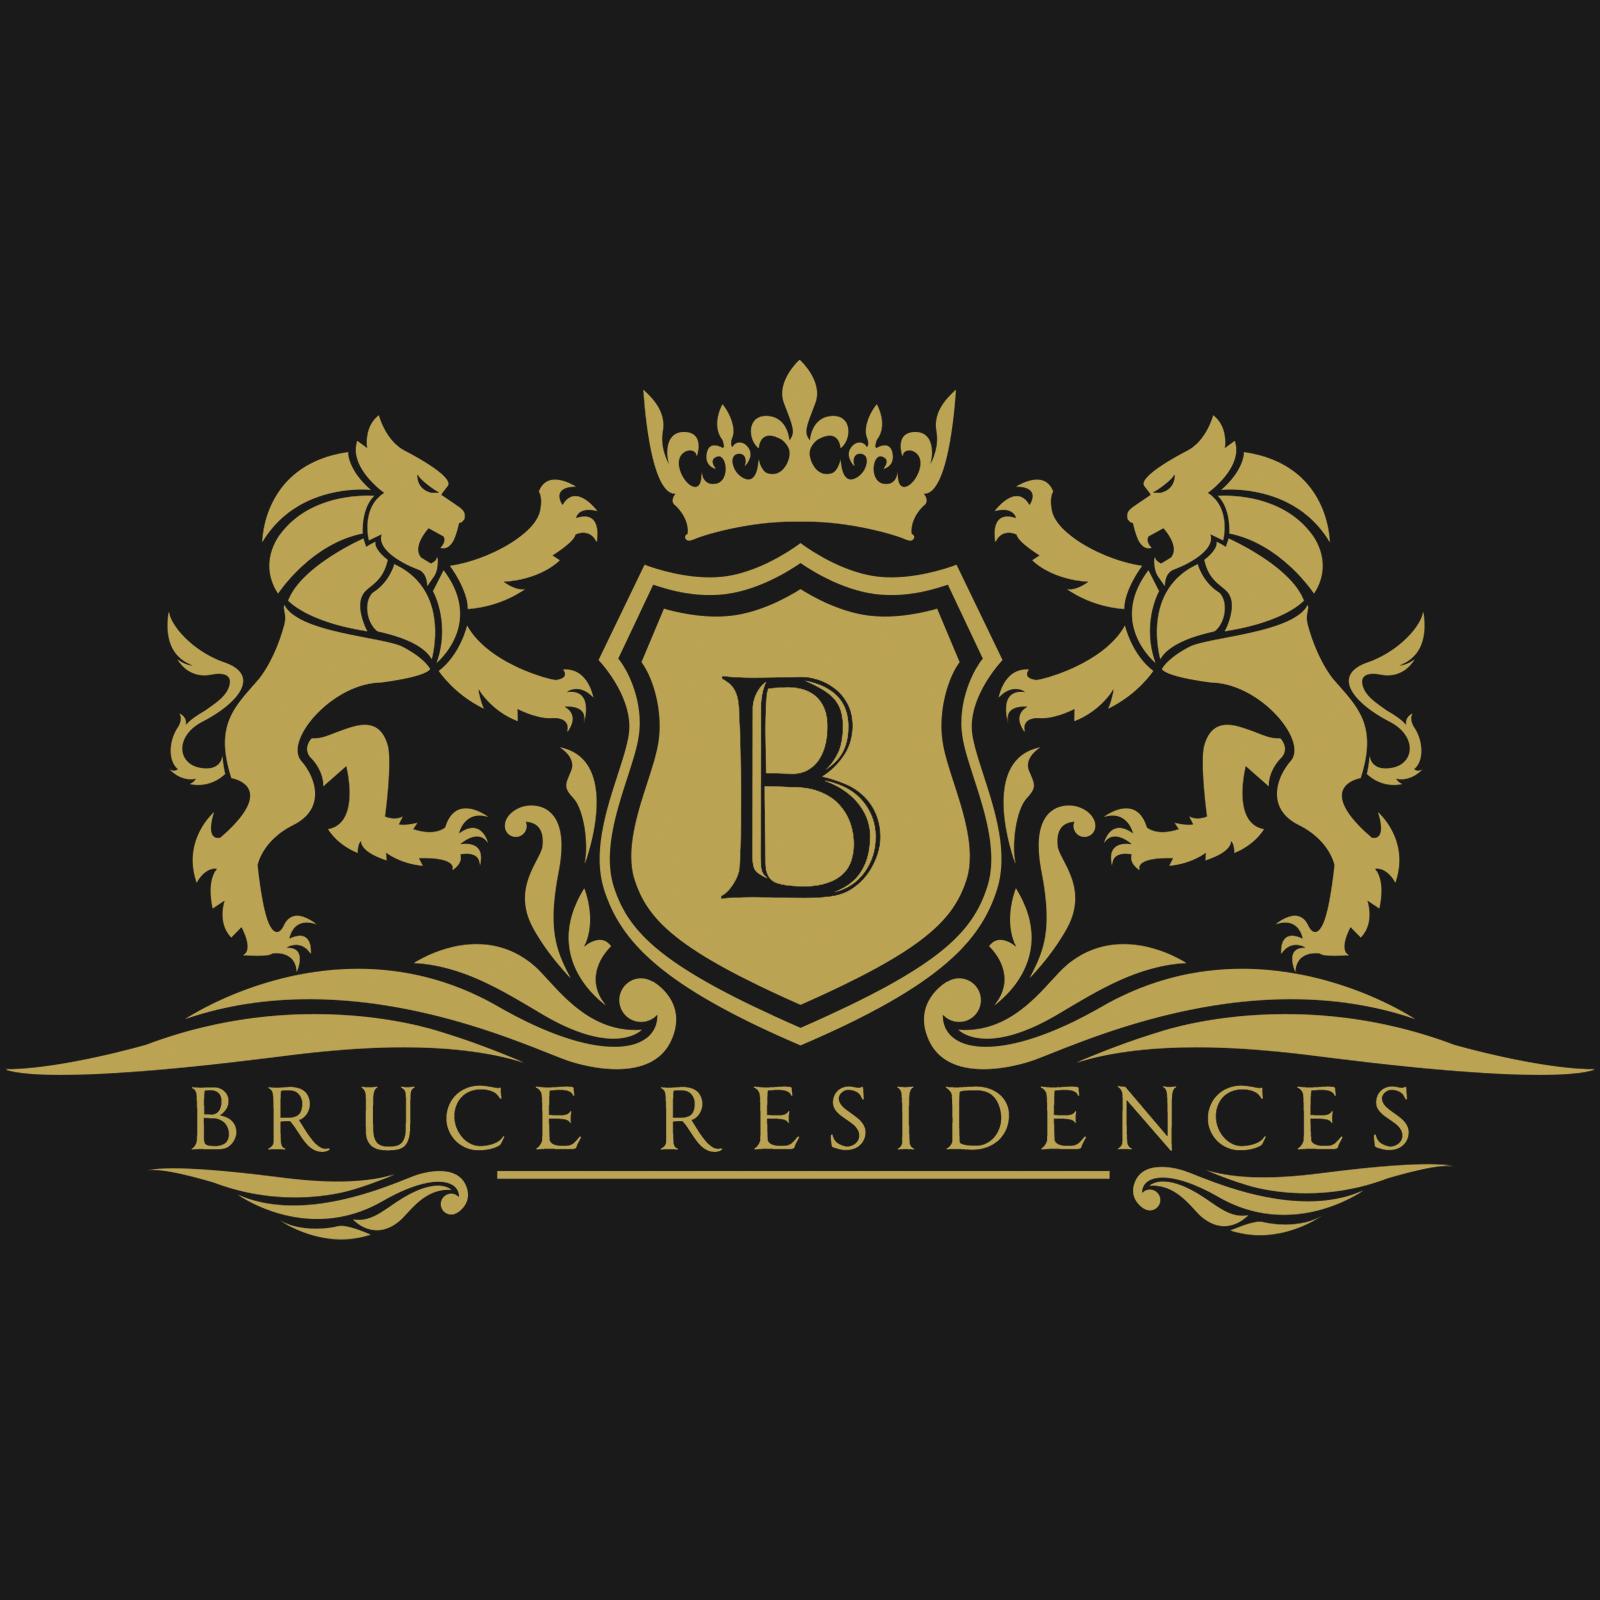 Bruce Residences